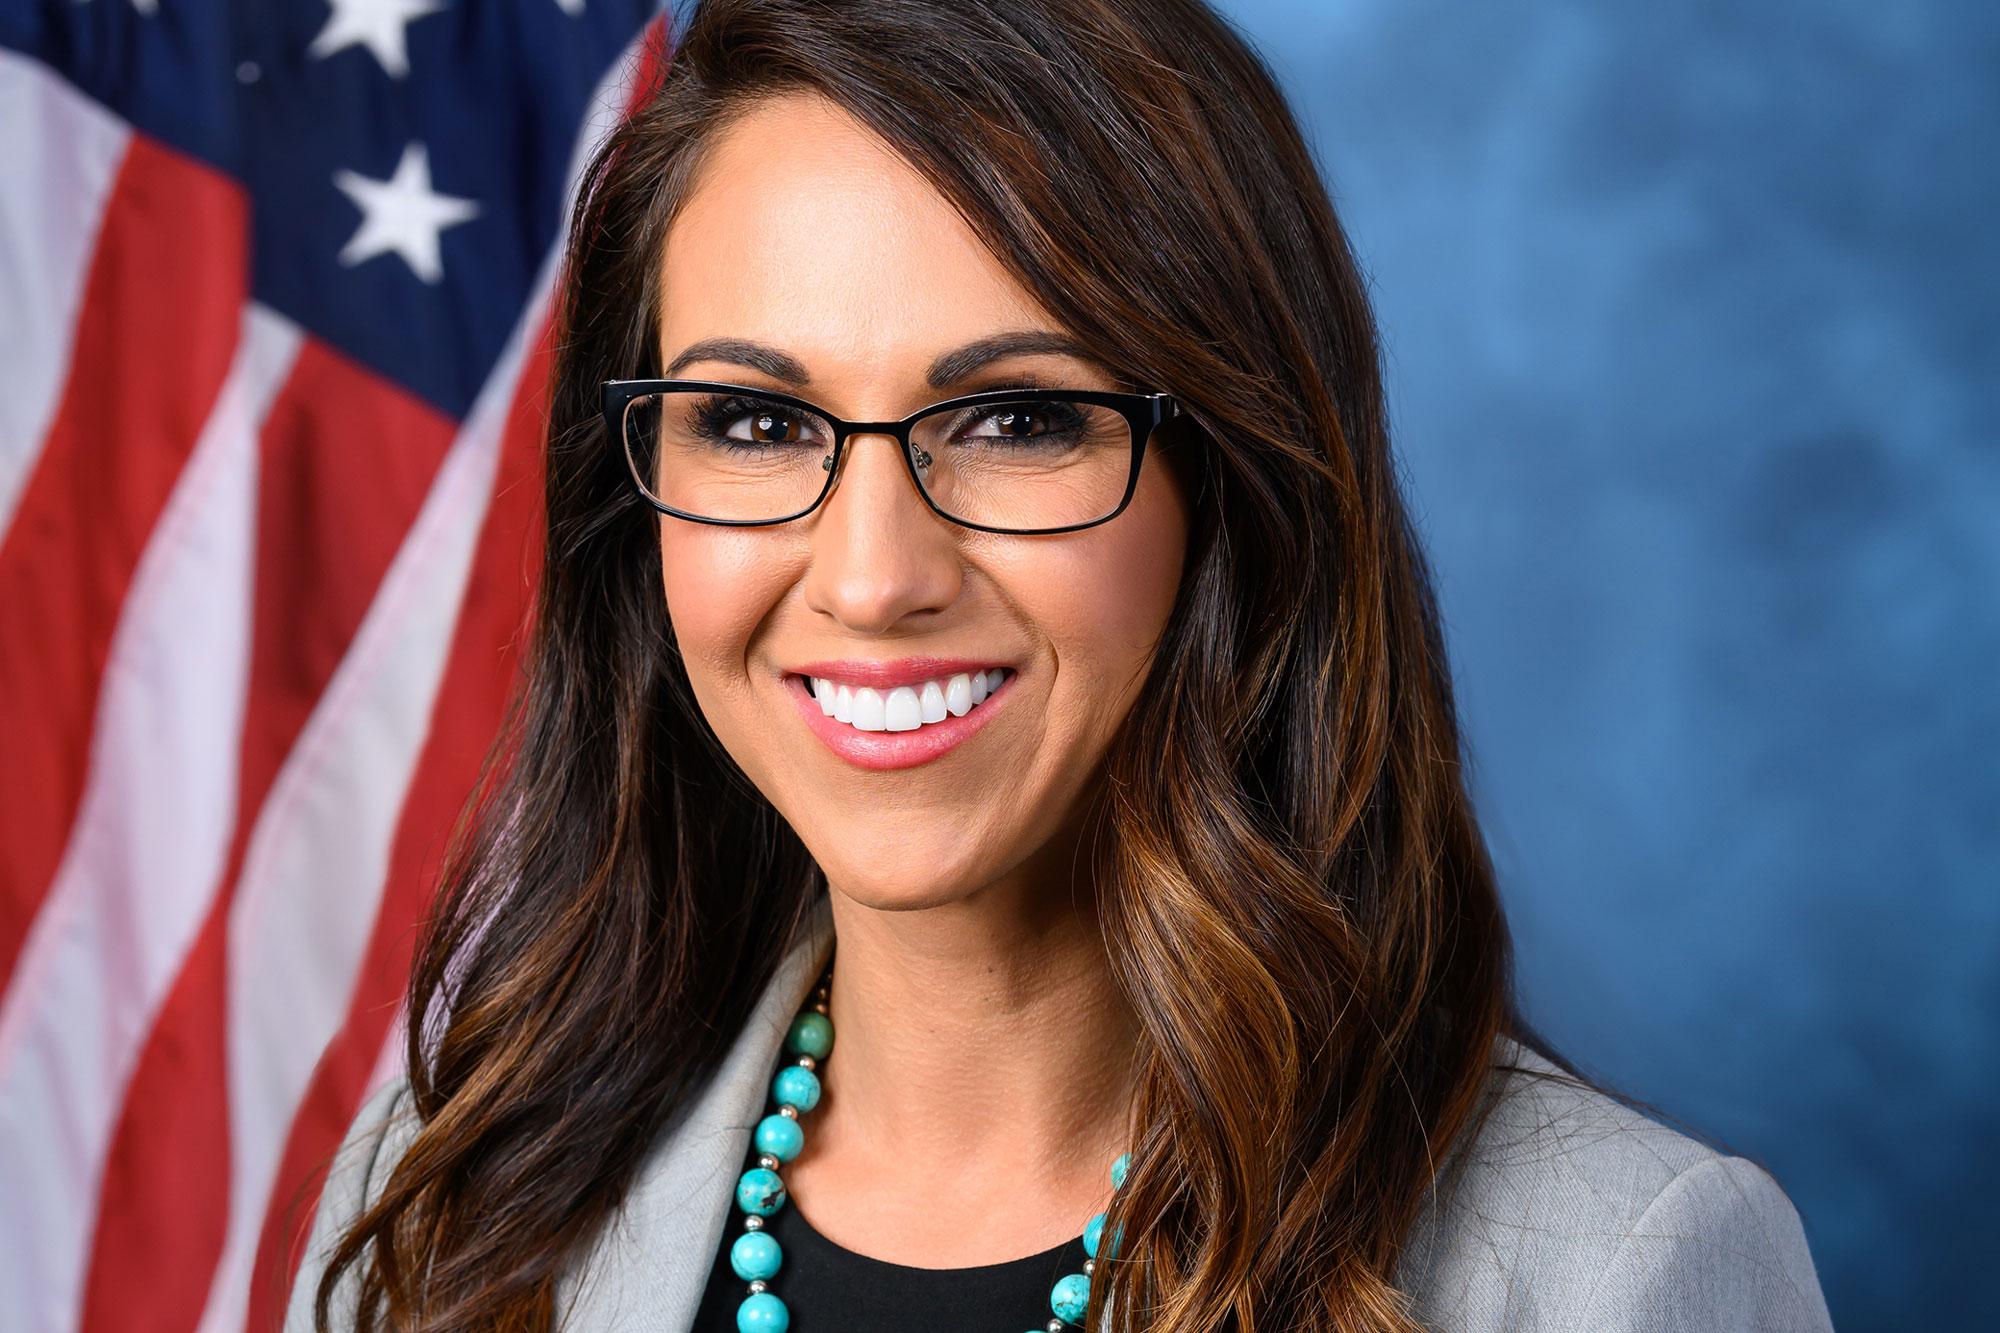 Congresswoman Lauren Boebert represents Colorado's 3rd Congressional District.